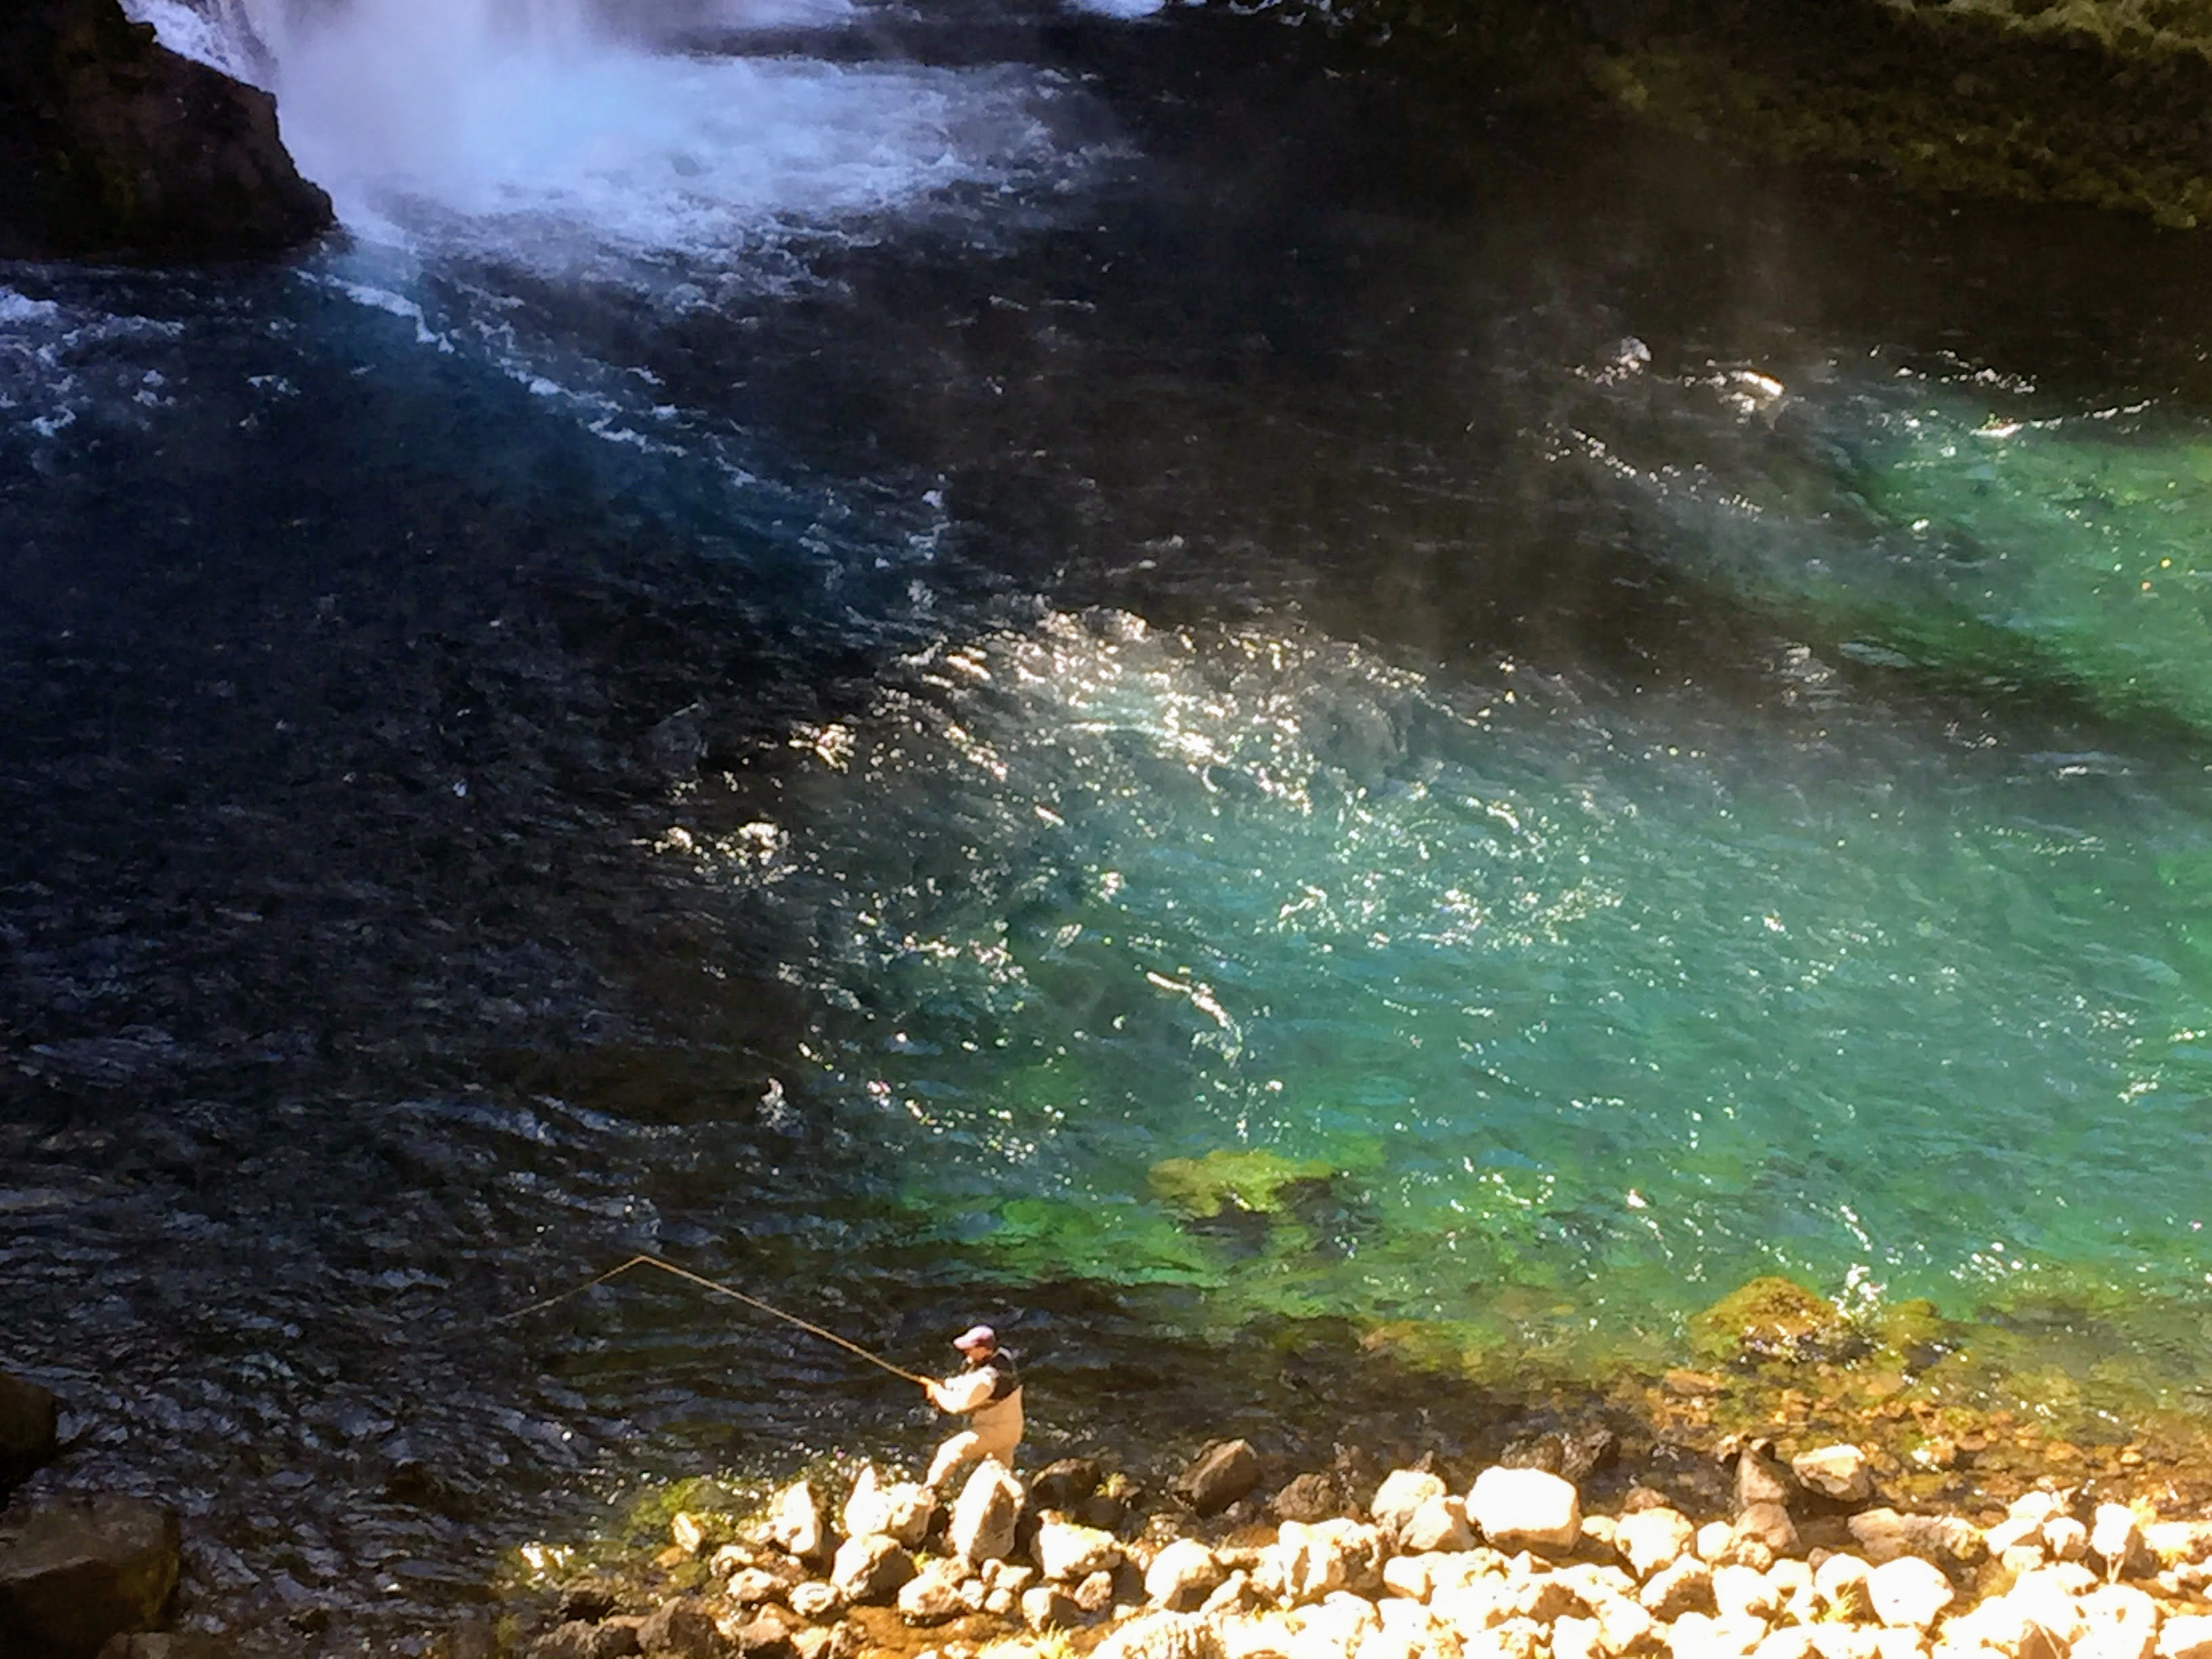 2017-10-05 California 02 Burney Falls 13